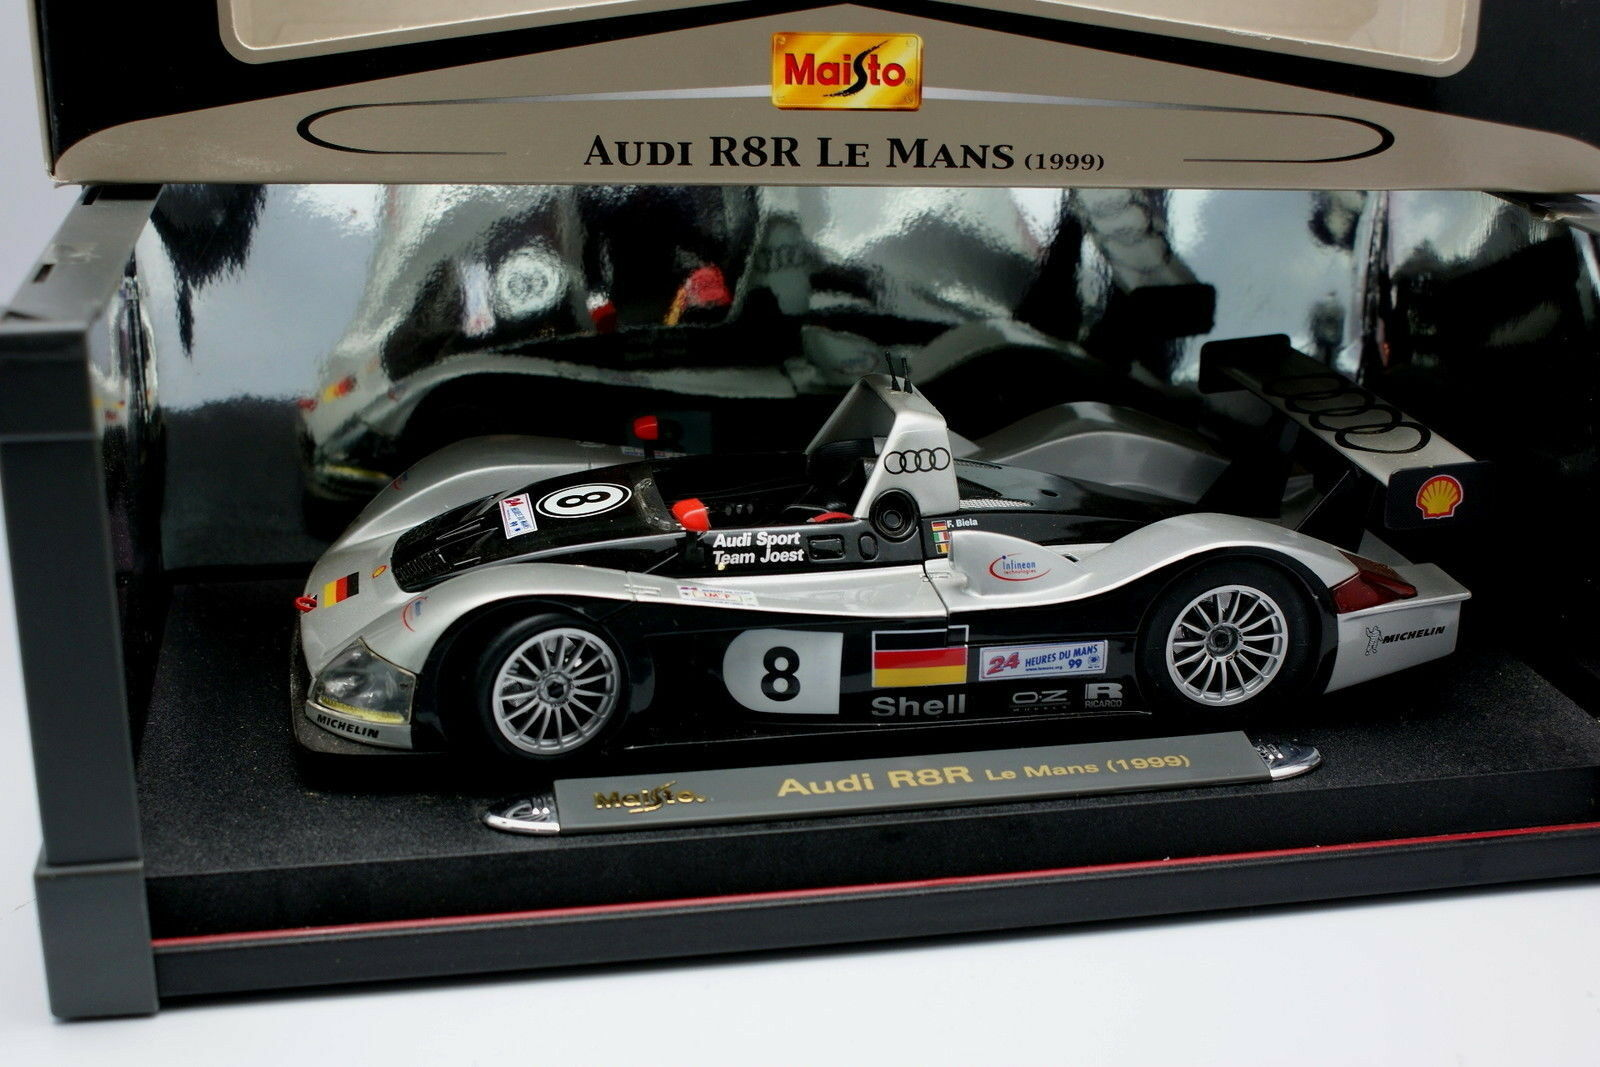 Maisto 1 18 -i R8R Le Mans 1999 N°8